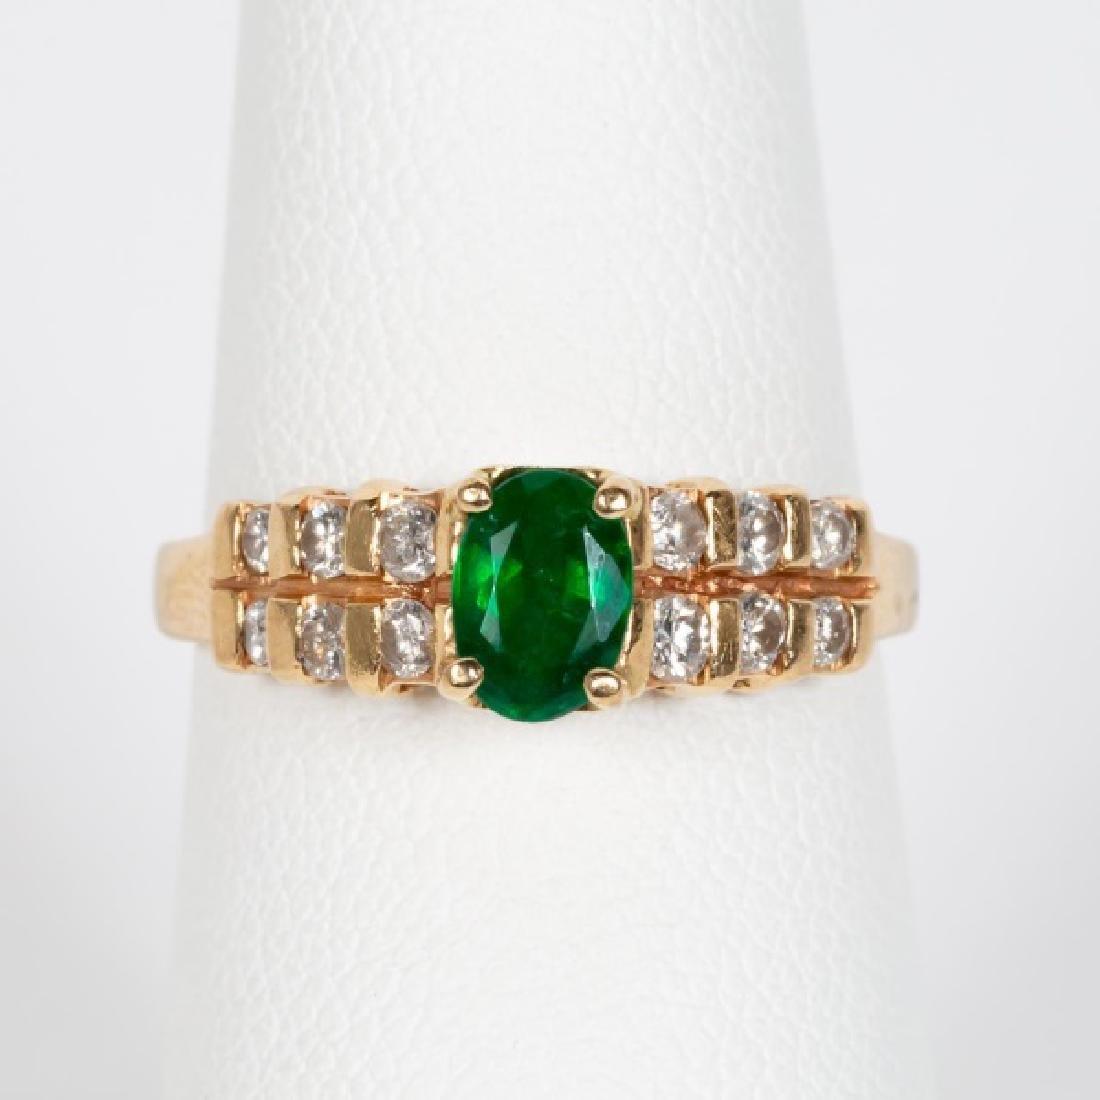 14k Yellow Gold, Emerald, & Diamond Ring